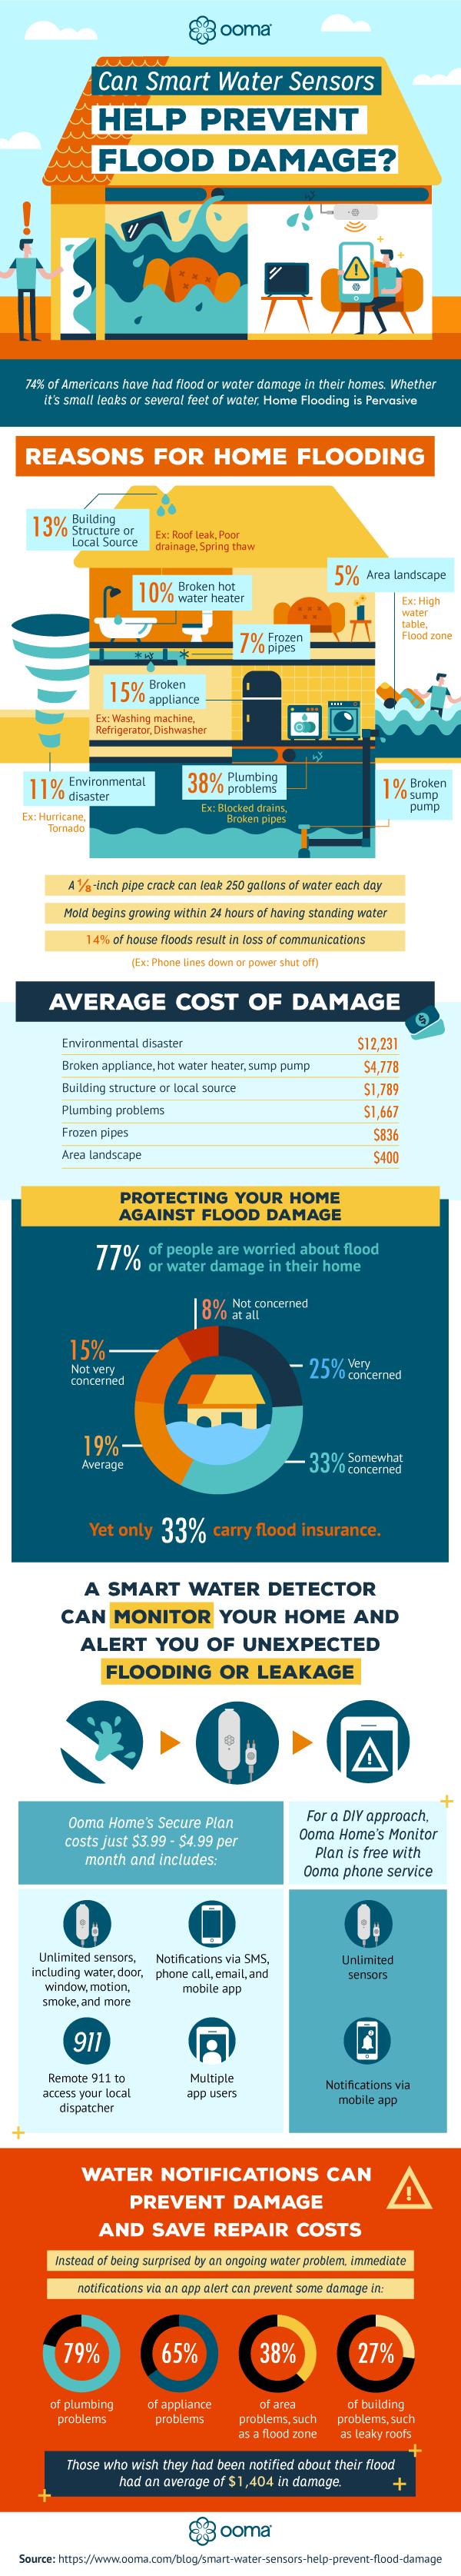 smart-water-sensors_infographic